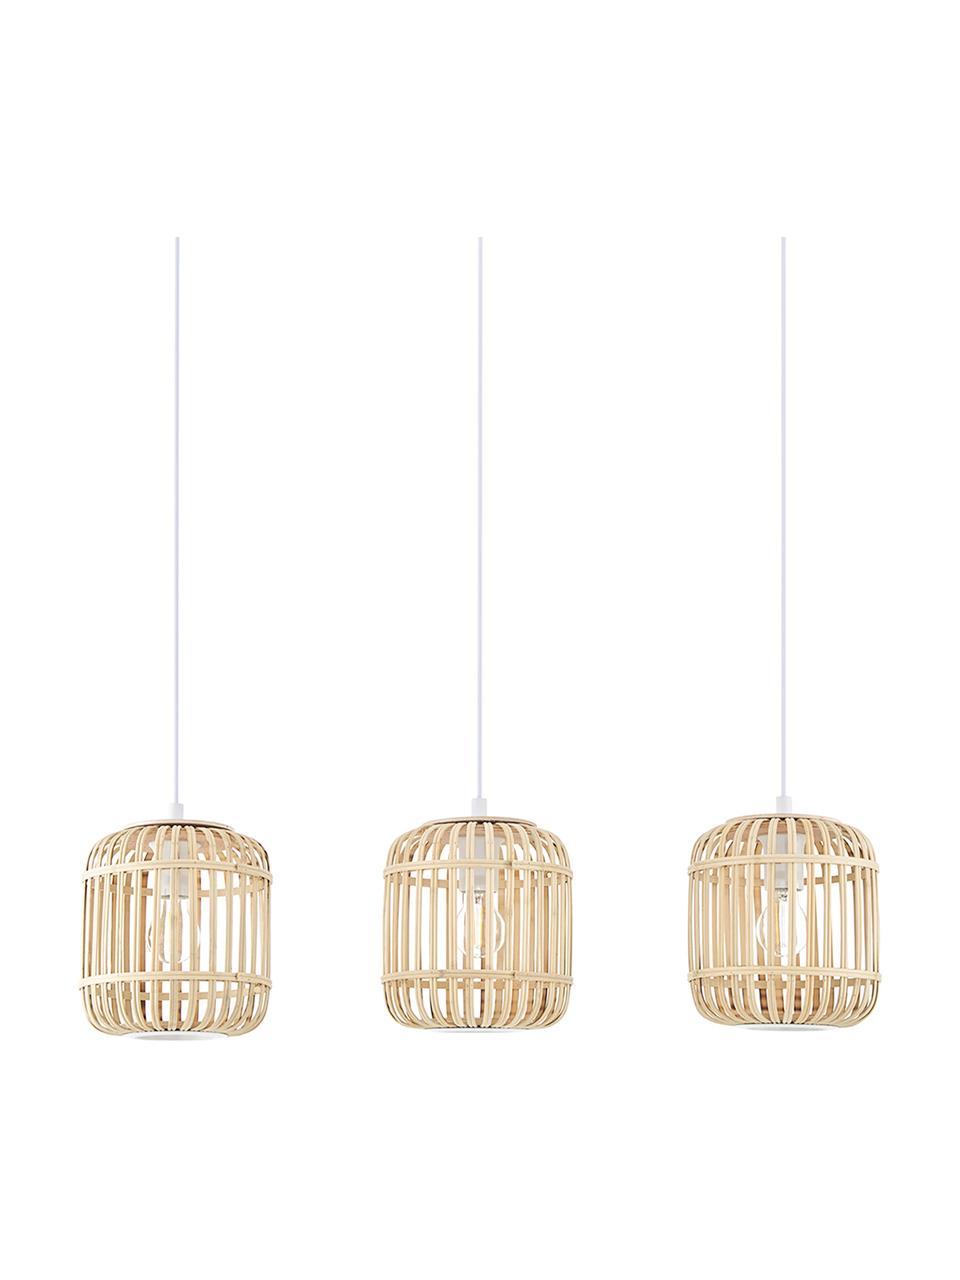 Lampada a sospensione in bambù Adam, Paralume: bambù legno, Baldacchino: metallo verniciato a polv, Bianco, beige, Larg. 78 x Alt. 24 cm